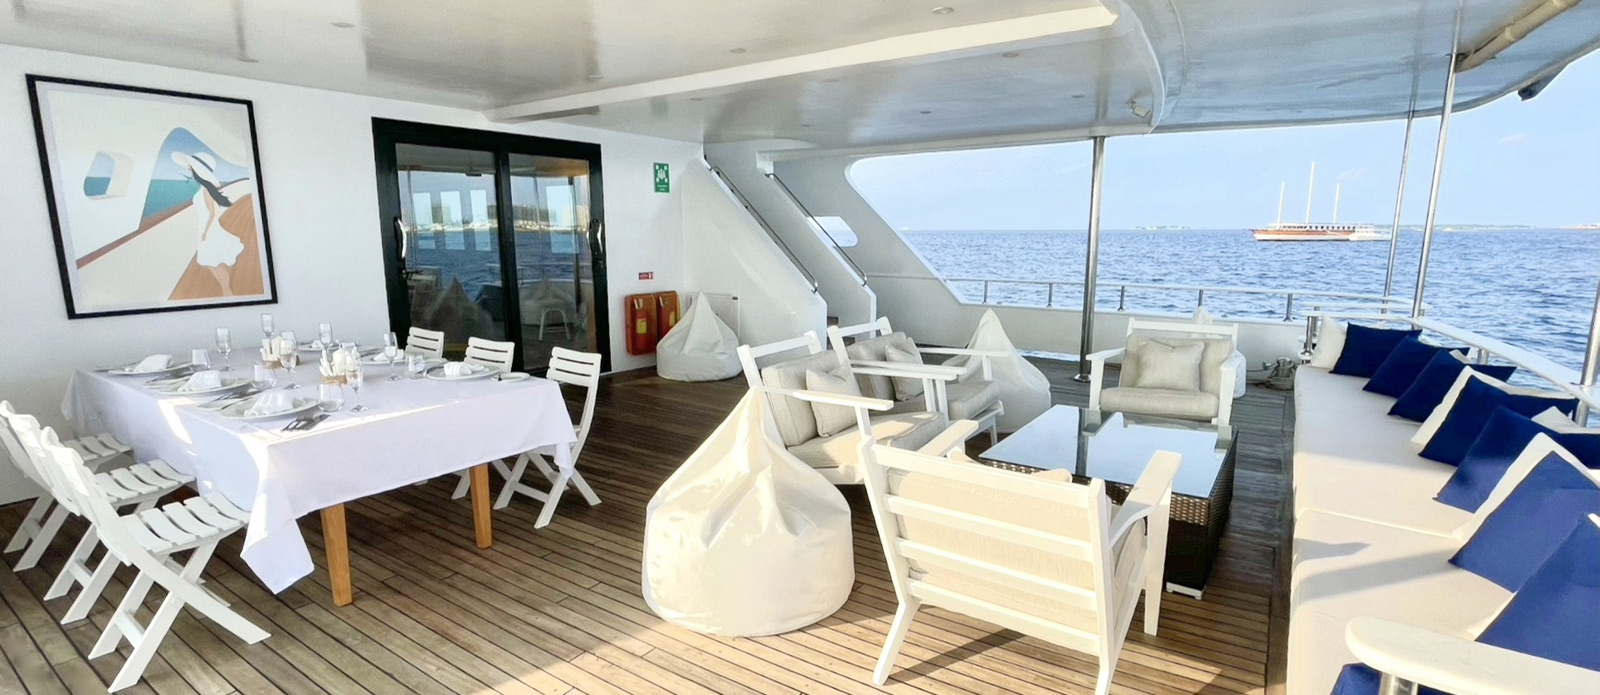 Safira-Luxury-Yacht-For-Sale-Interior-13